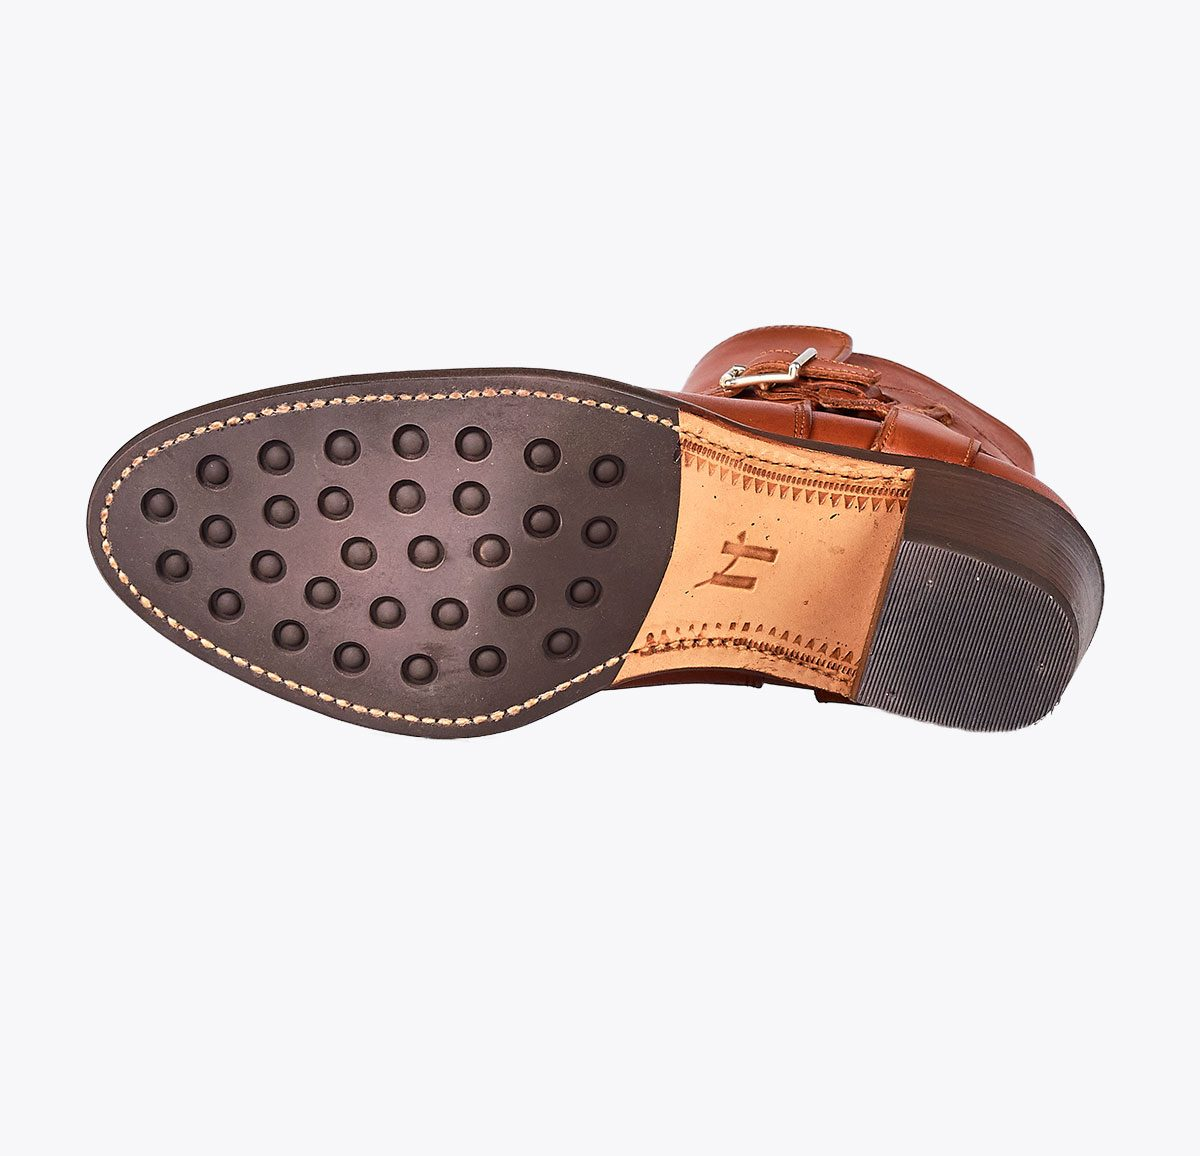 Botín Yessy, tailor made shoes, schuhe nach mass en mandalashoes Santanyí Mallorca